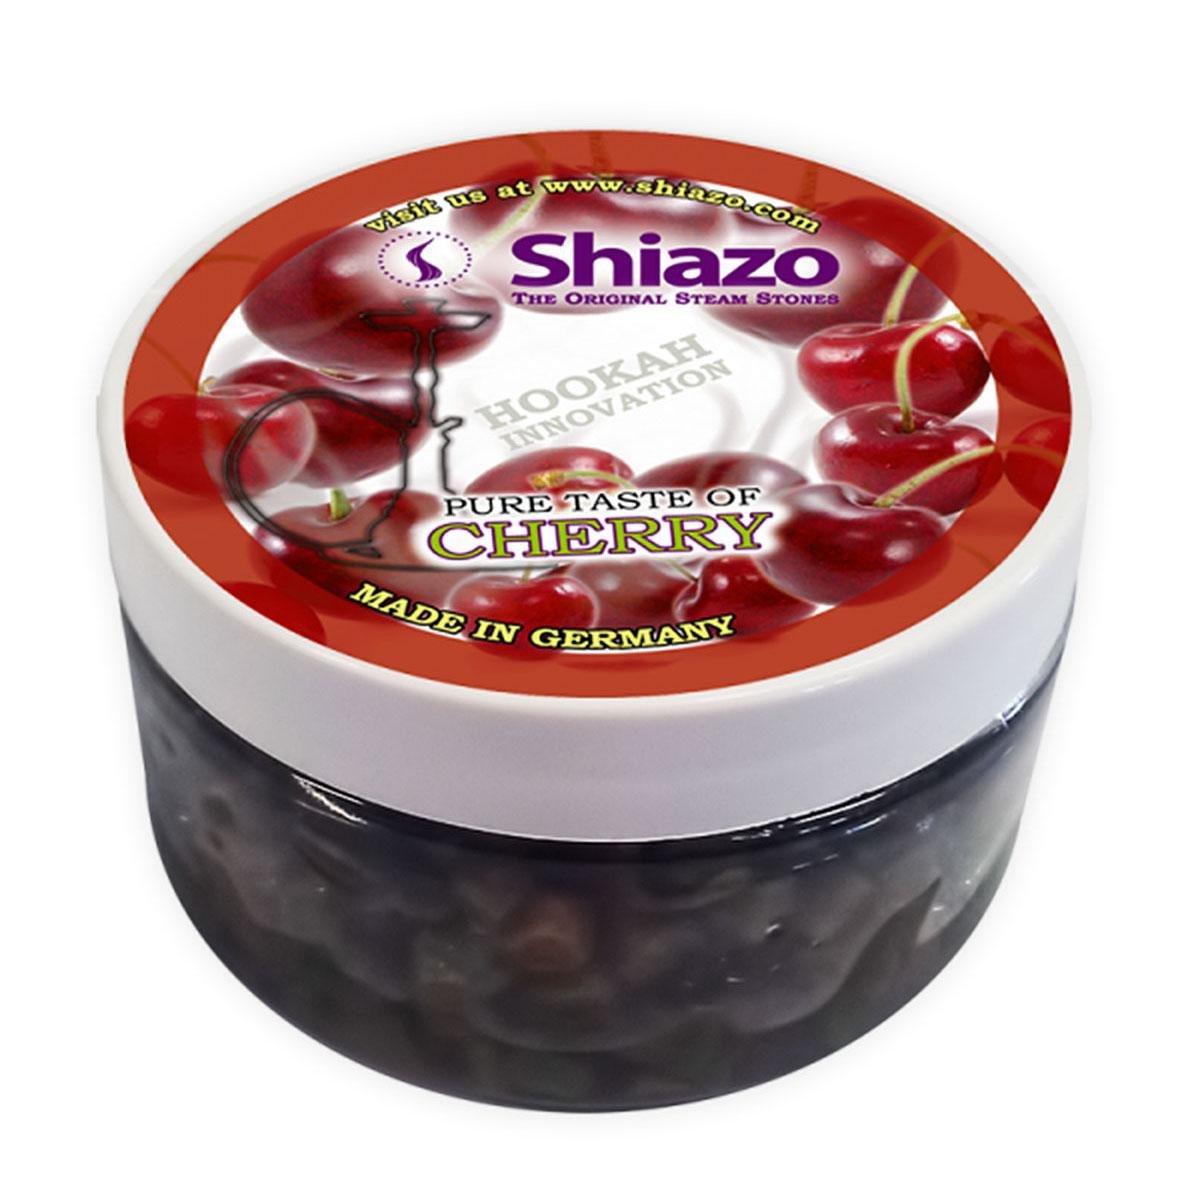 Shiazo Steine - Kirsch - Nikotinfrei - 100gr.